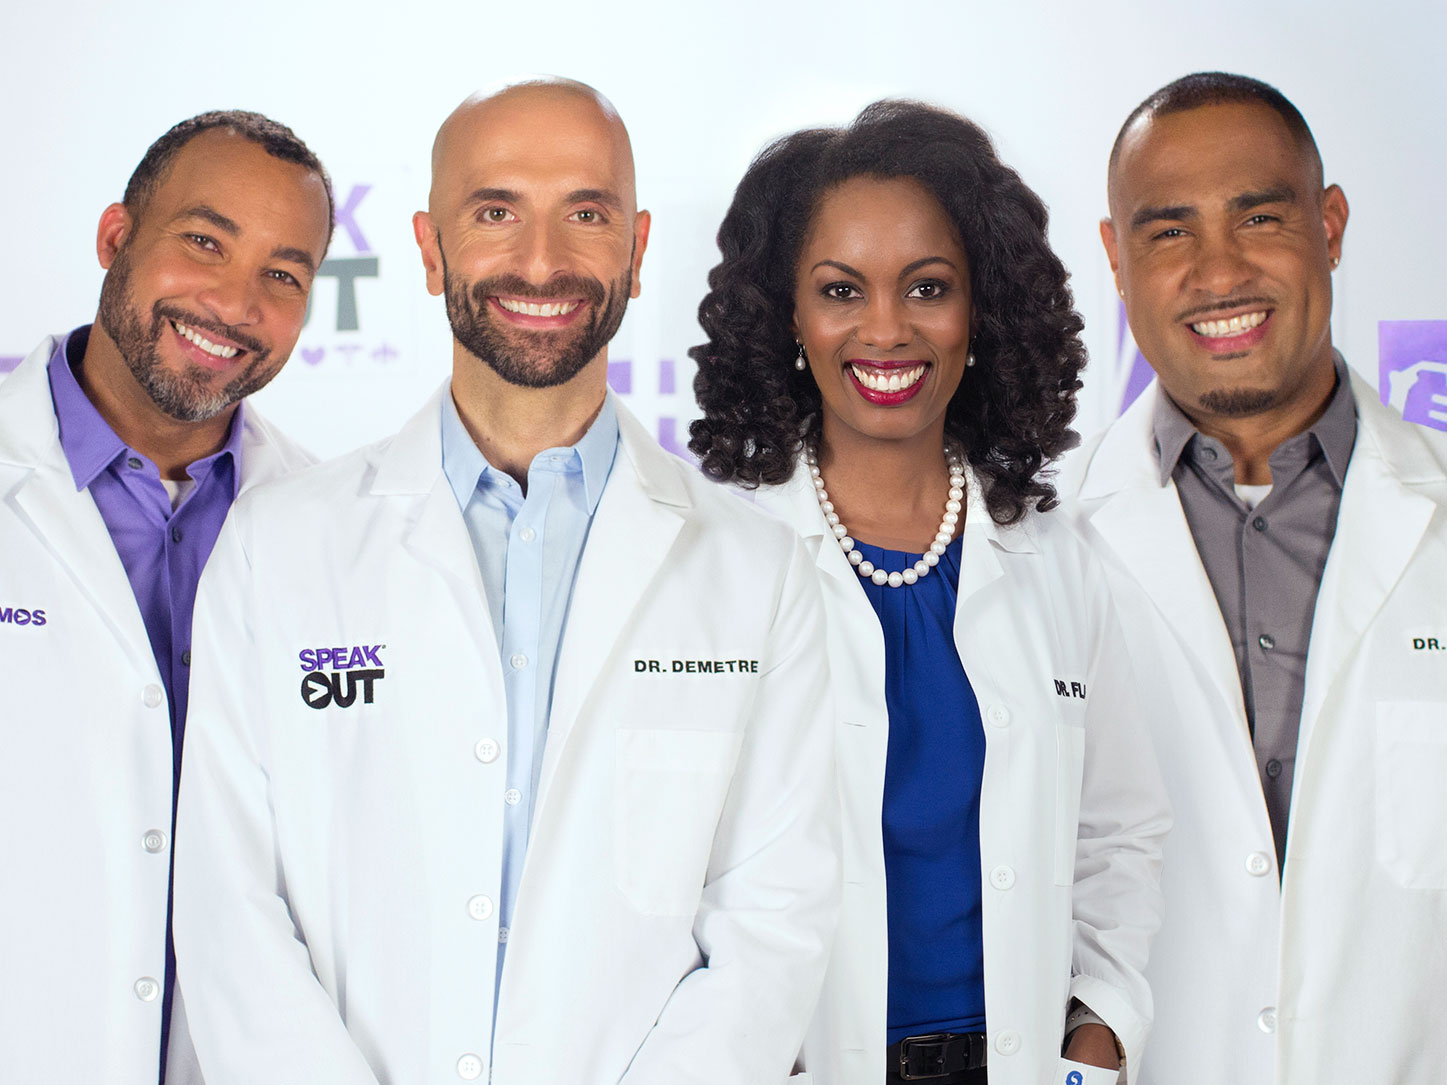 Meet the Doctors of #AsktheHIVDoc